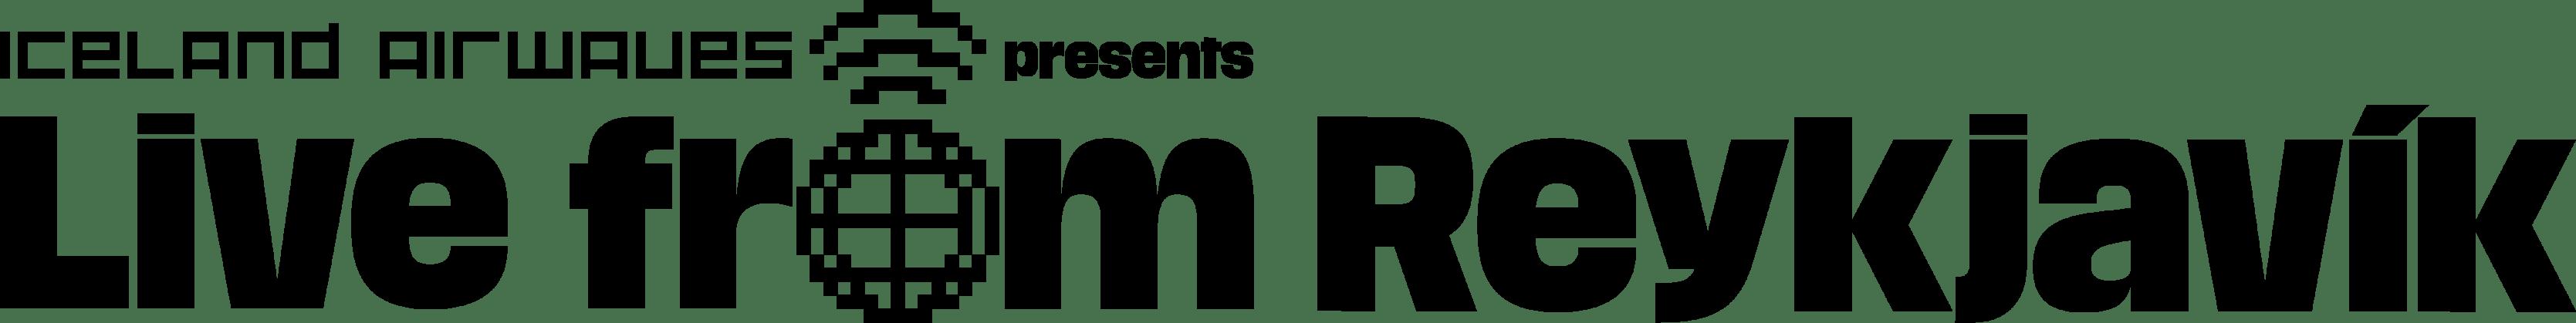 iceland-airwaves-live-from-reykjaví-2021-logo